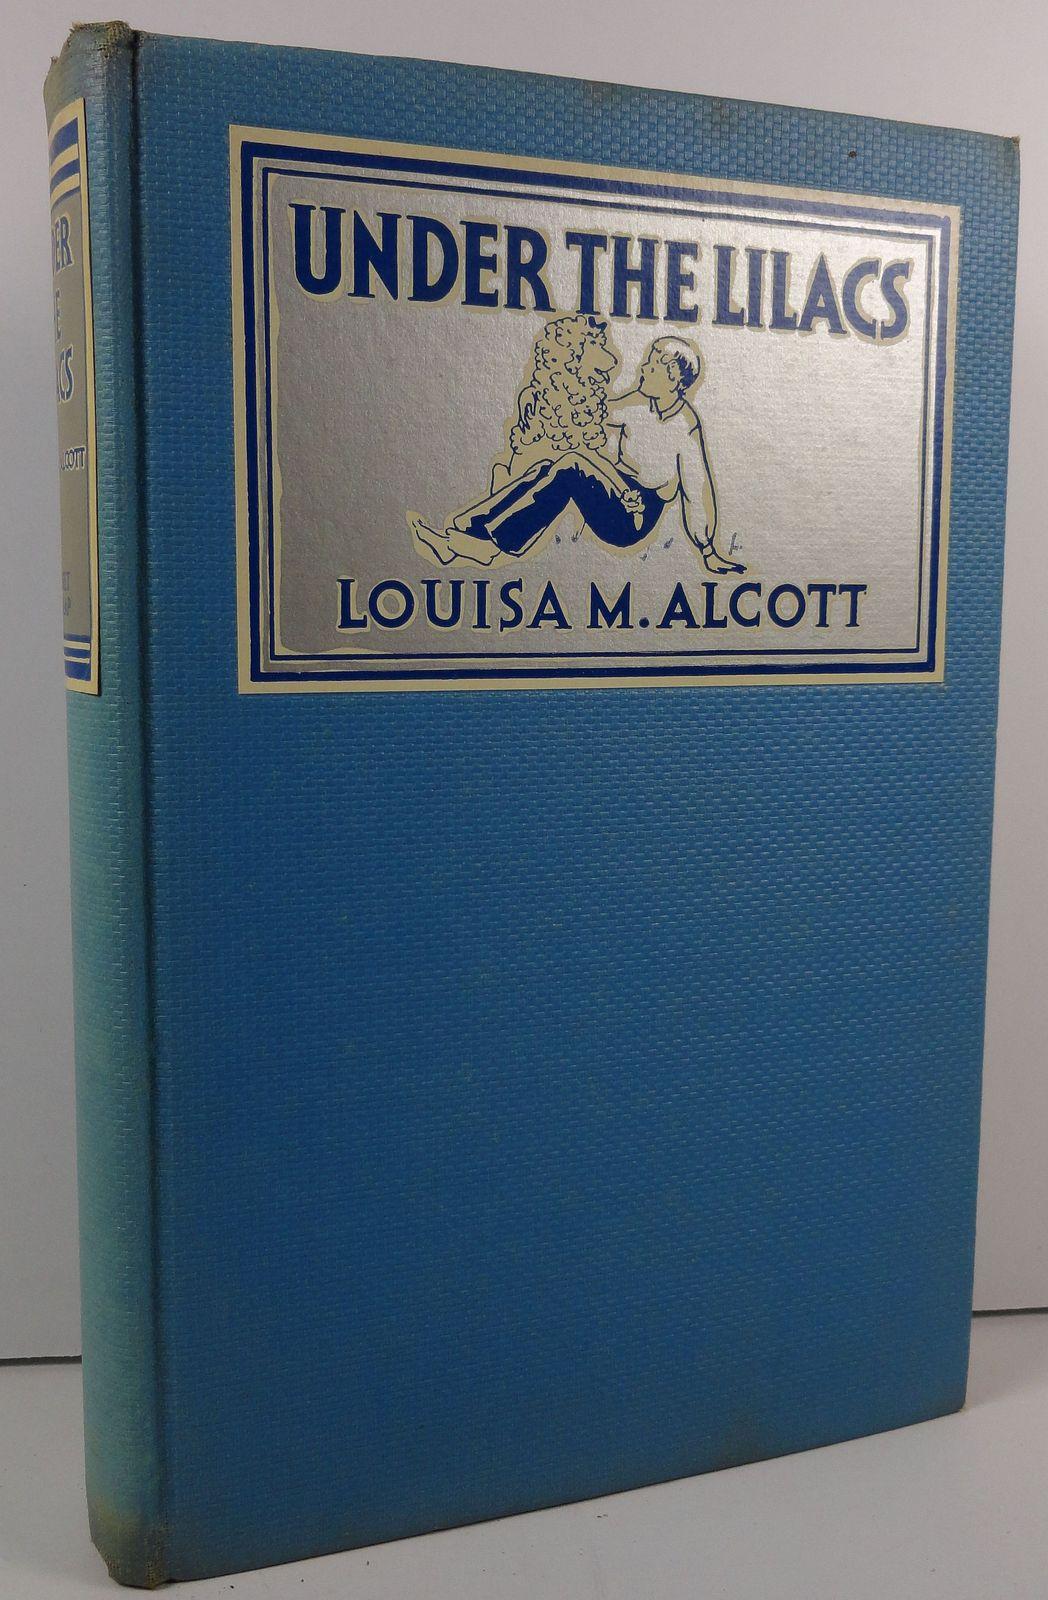 Under the Lilacs Louisa M. Alcott HC/DJ Grosset and Dunlap